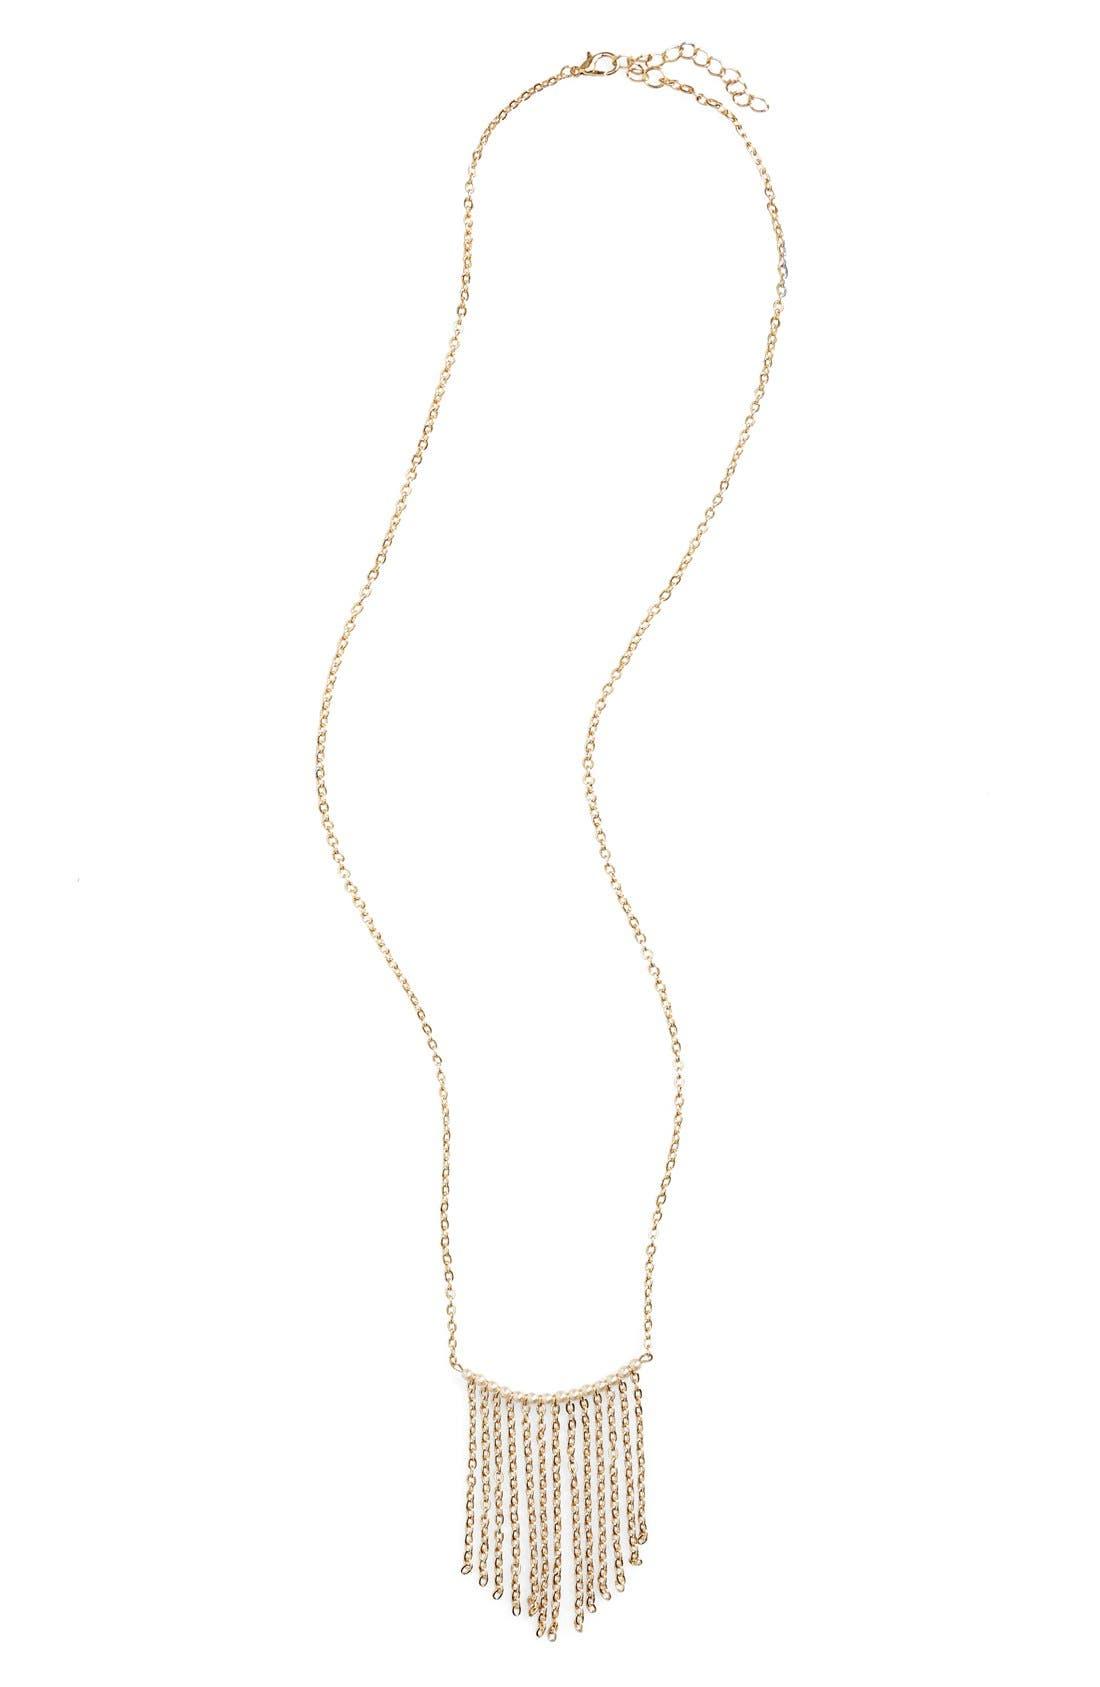 Alternate Image 1 Selected - BP. Beaded Tassel Necklace